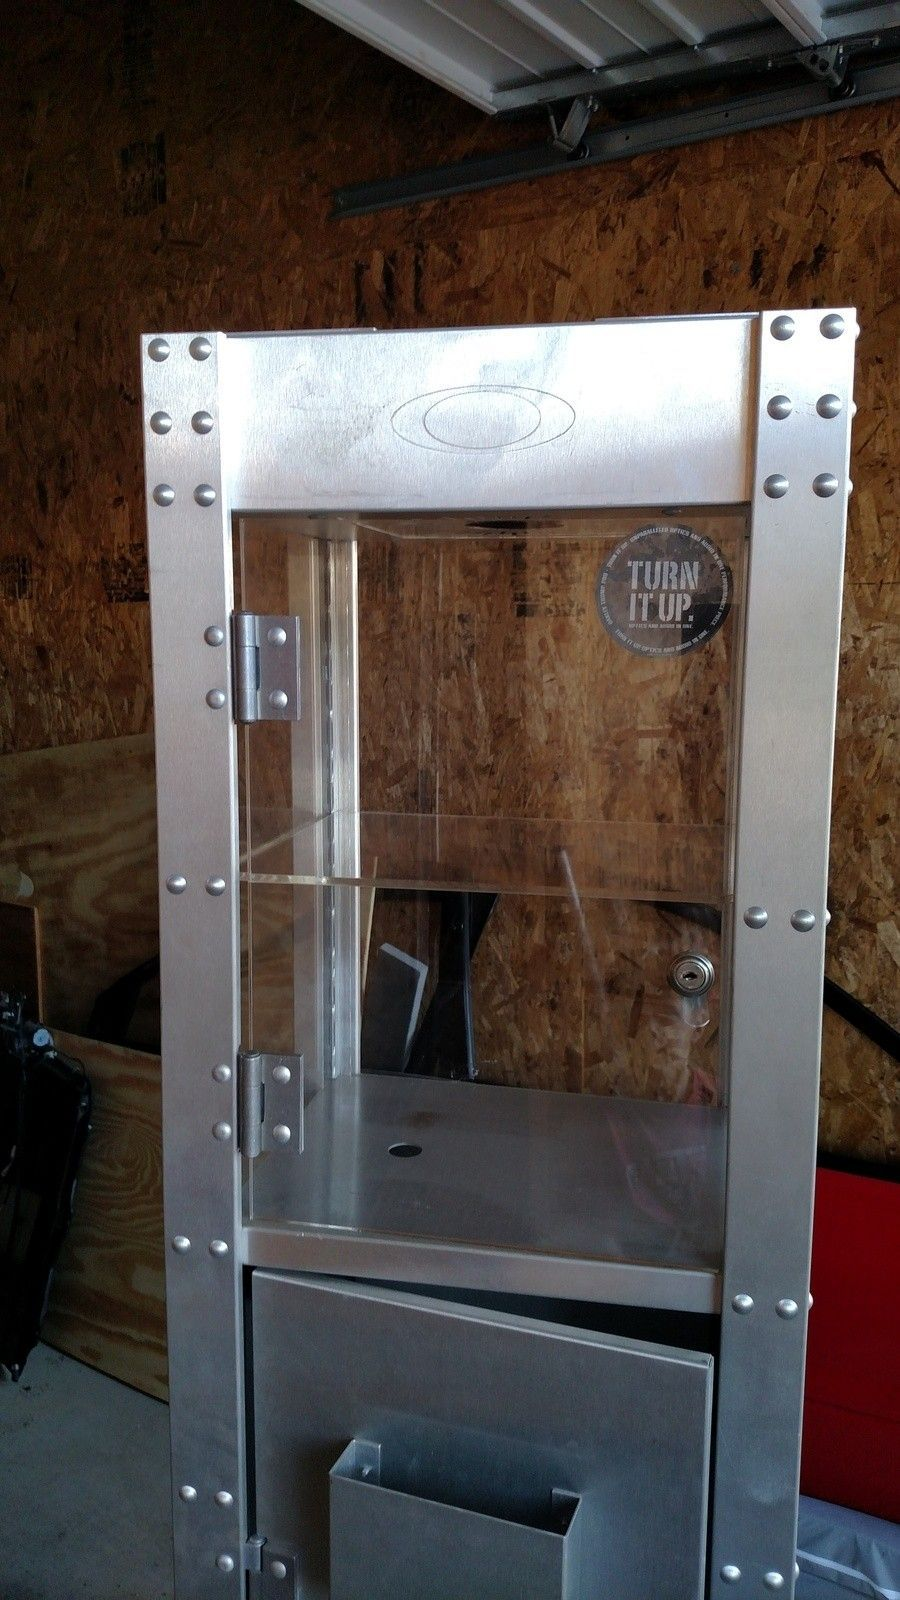 Thump display case - IMG_20150907_175148979.jpg